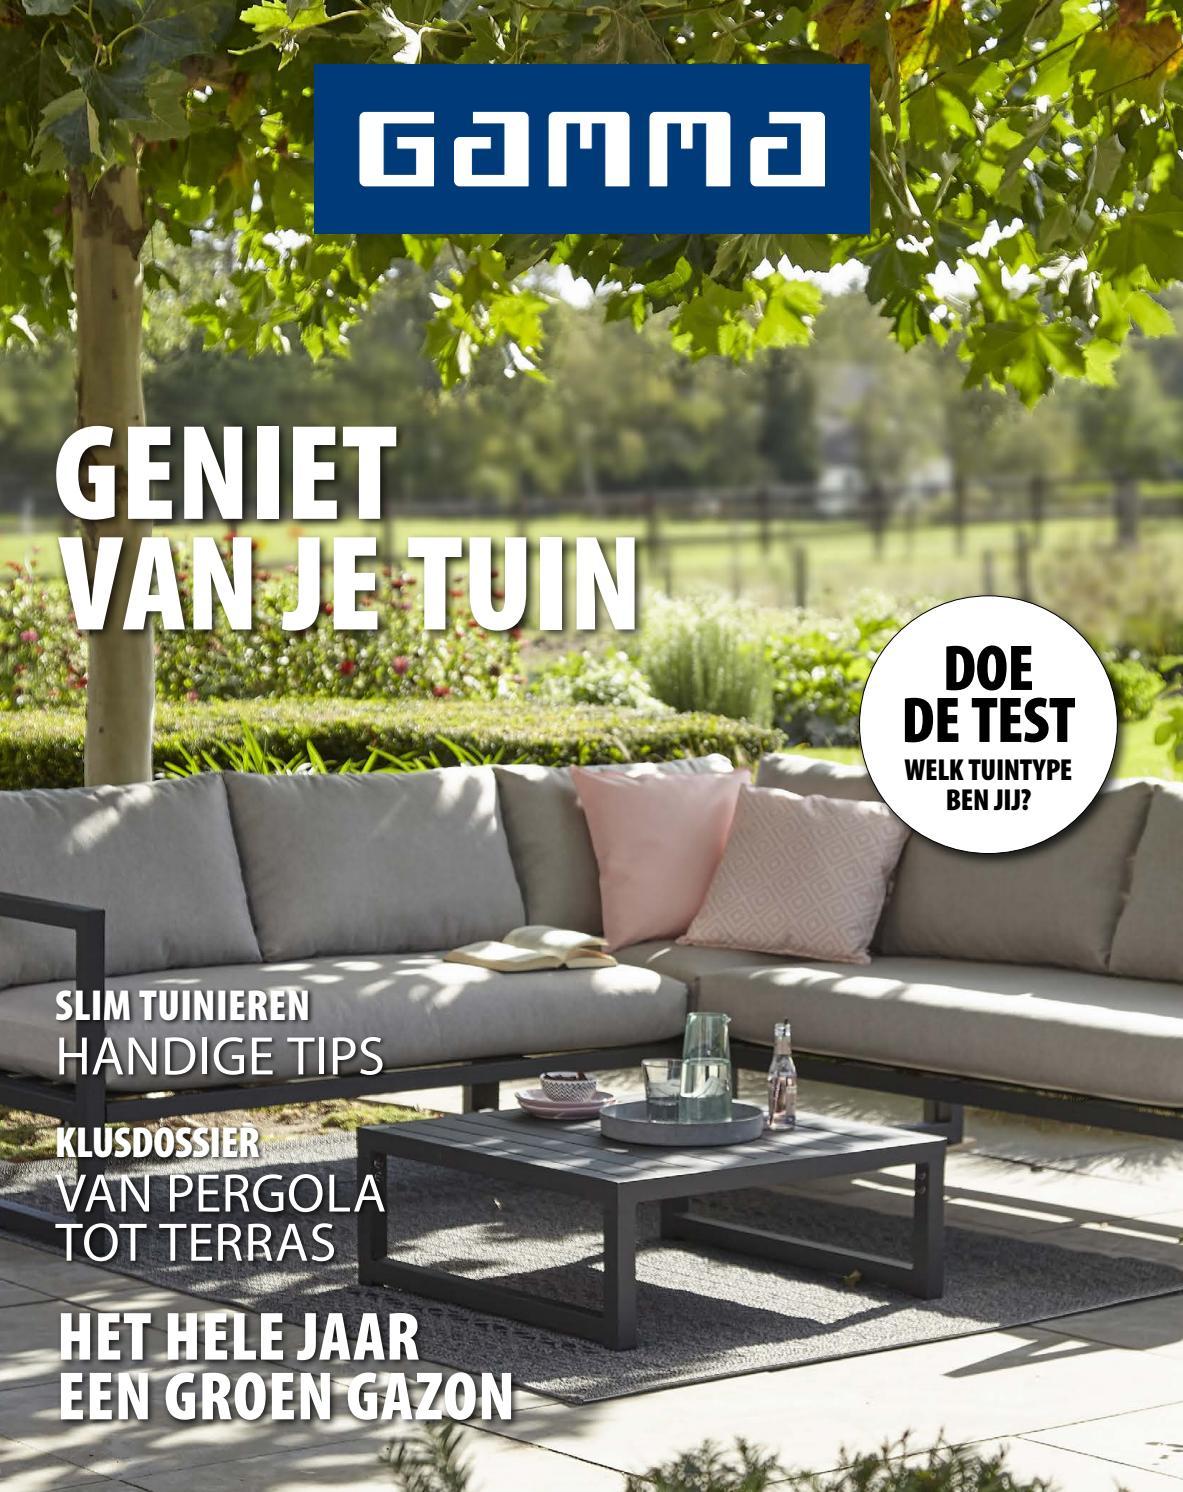 Eettafel Stoelen Gamma.Gamma Tuinmgazine By Vipmedia Breda Issuu